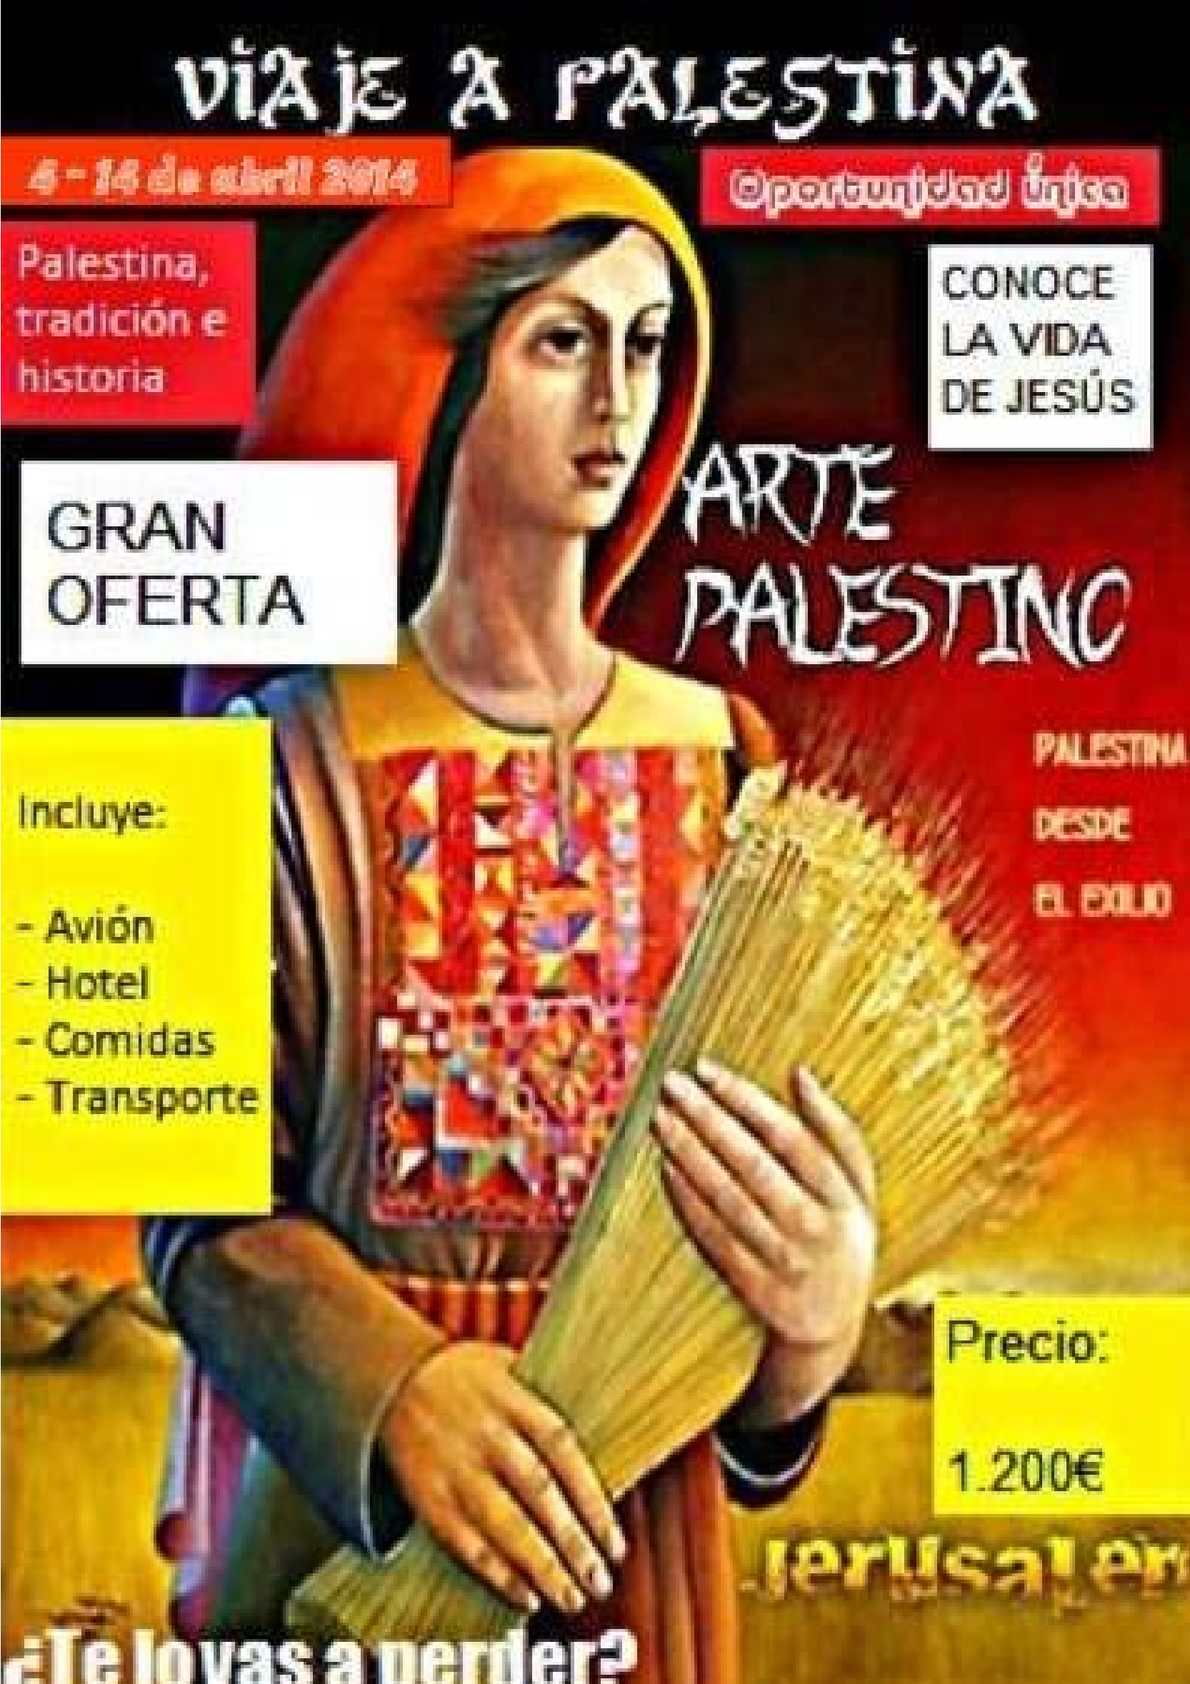 Viaje a Palestina ok2